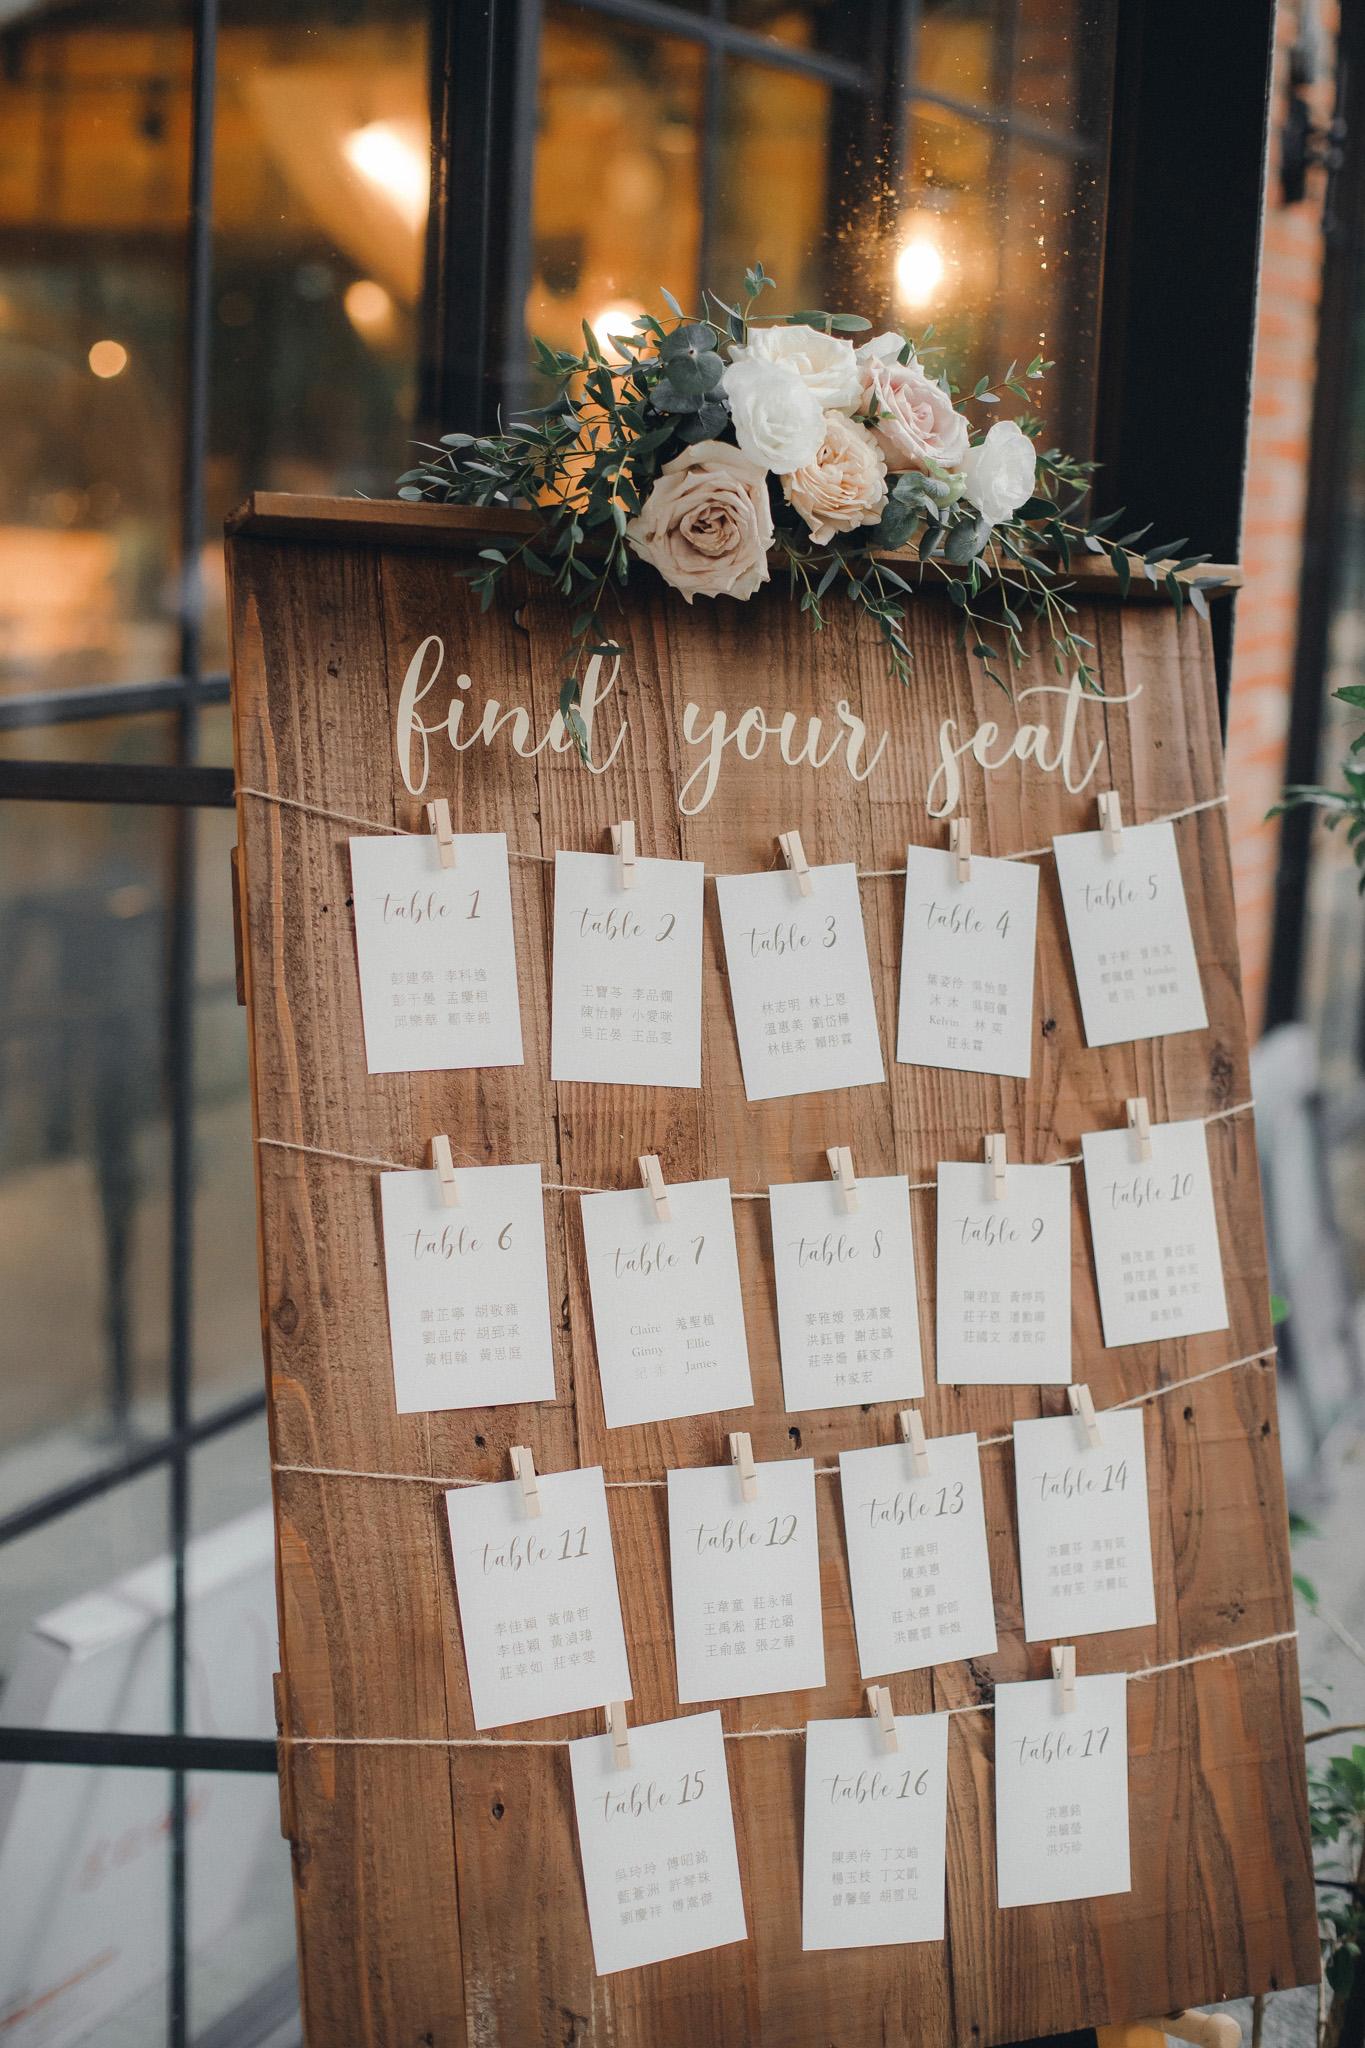 EW 台北婚攝 居米 濟南教會 Brick Yard 33 美軍俱樂部 婚禮 婚宴-59